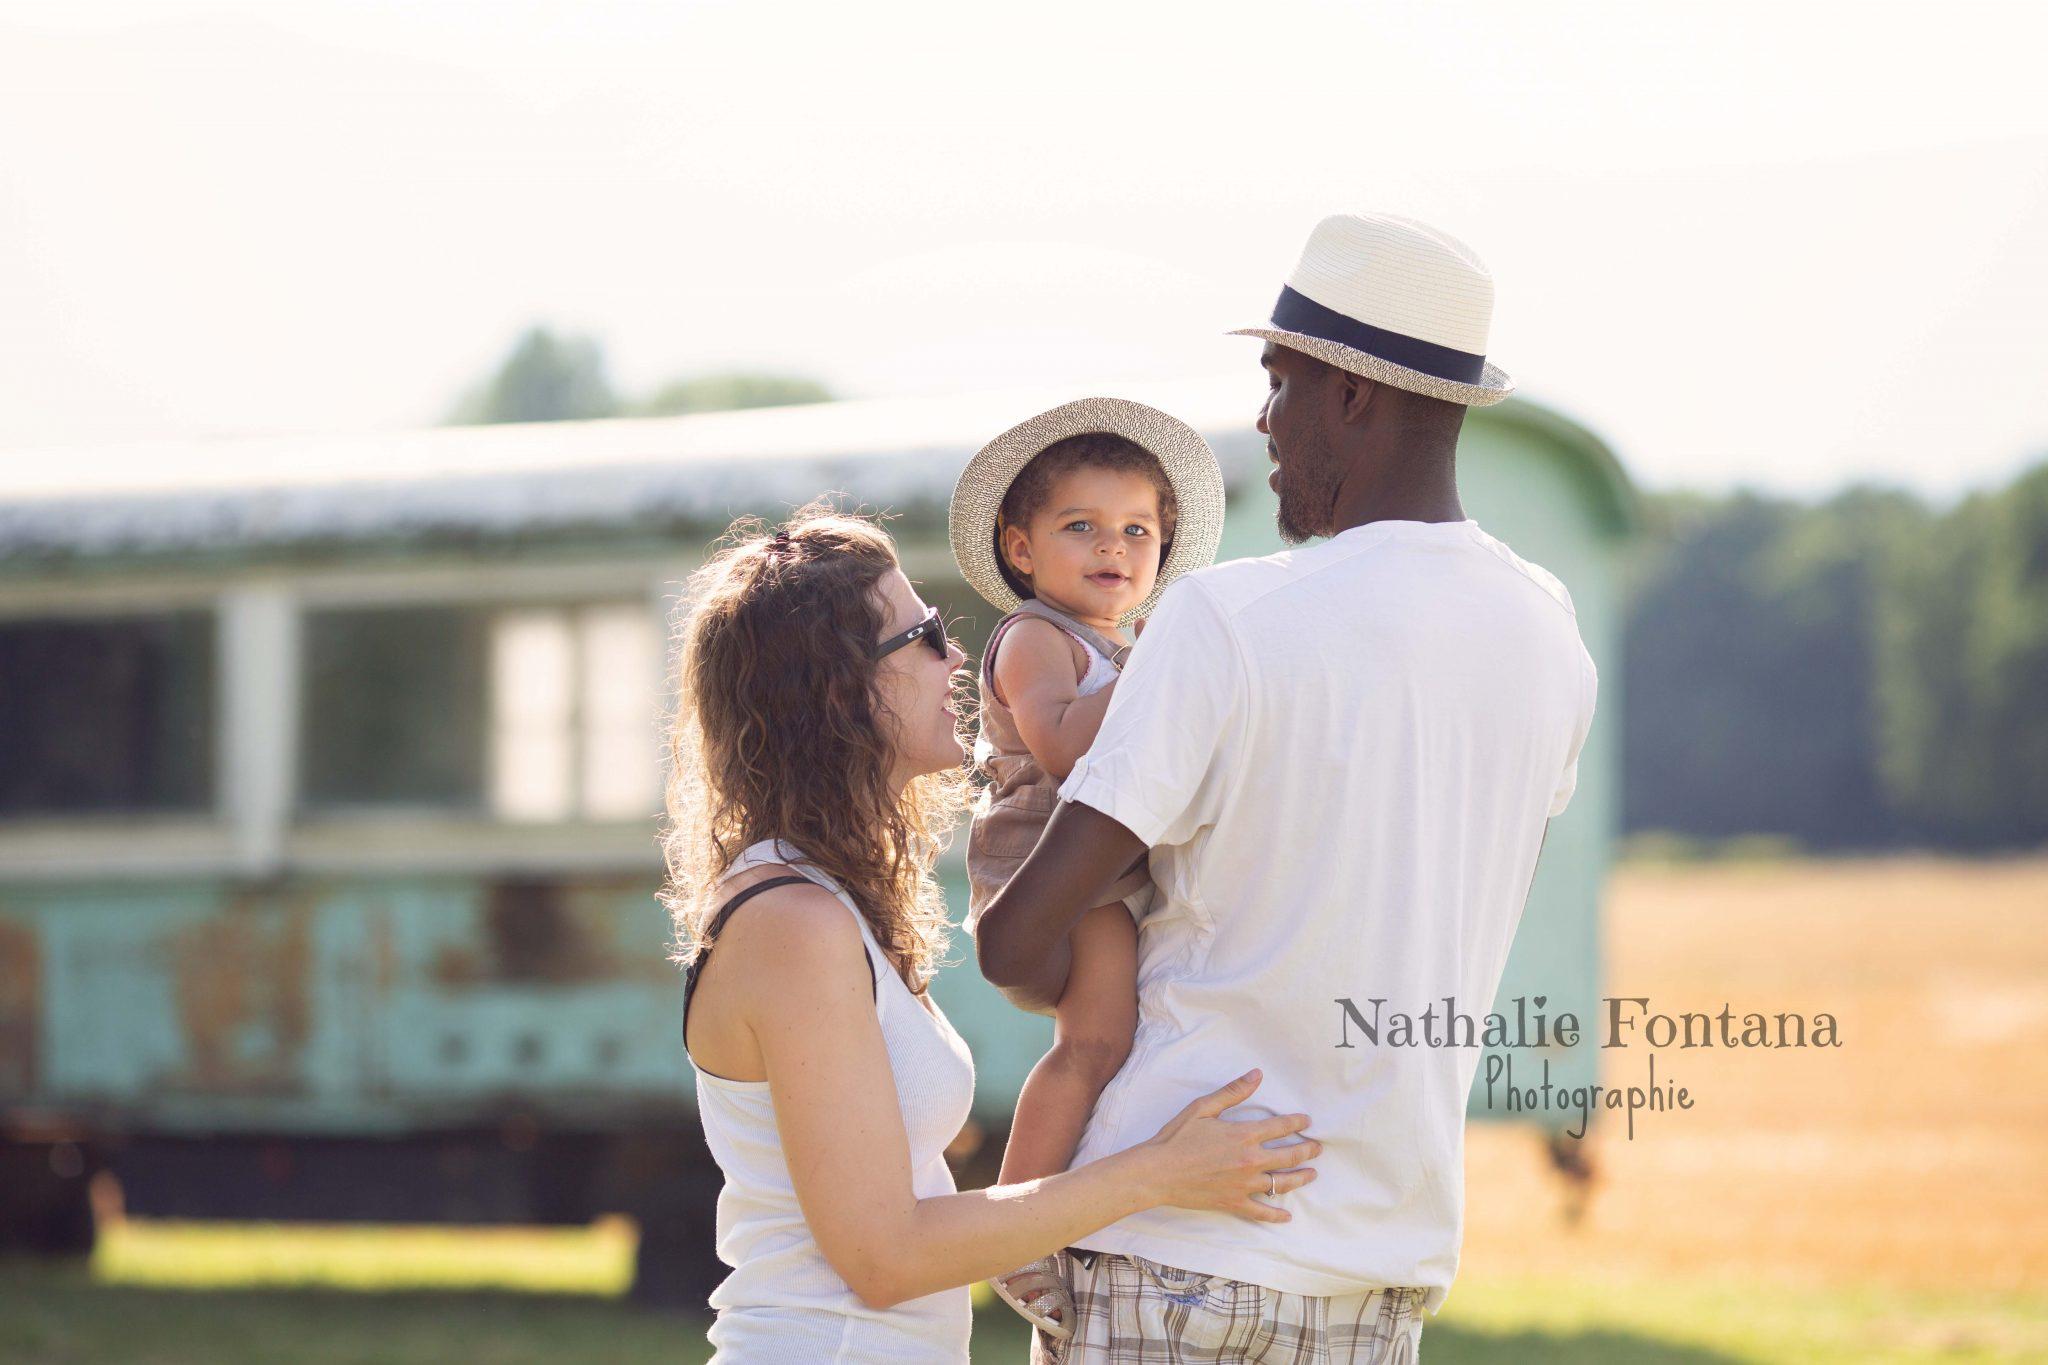 Séance photos Famille - Aline